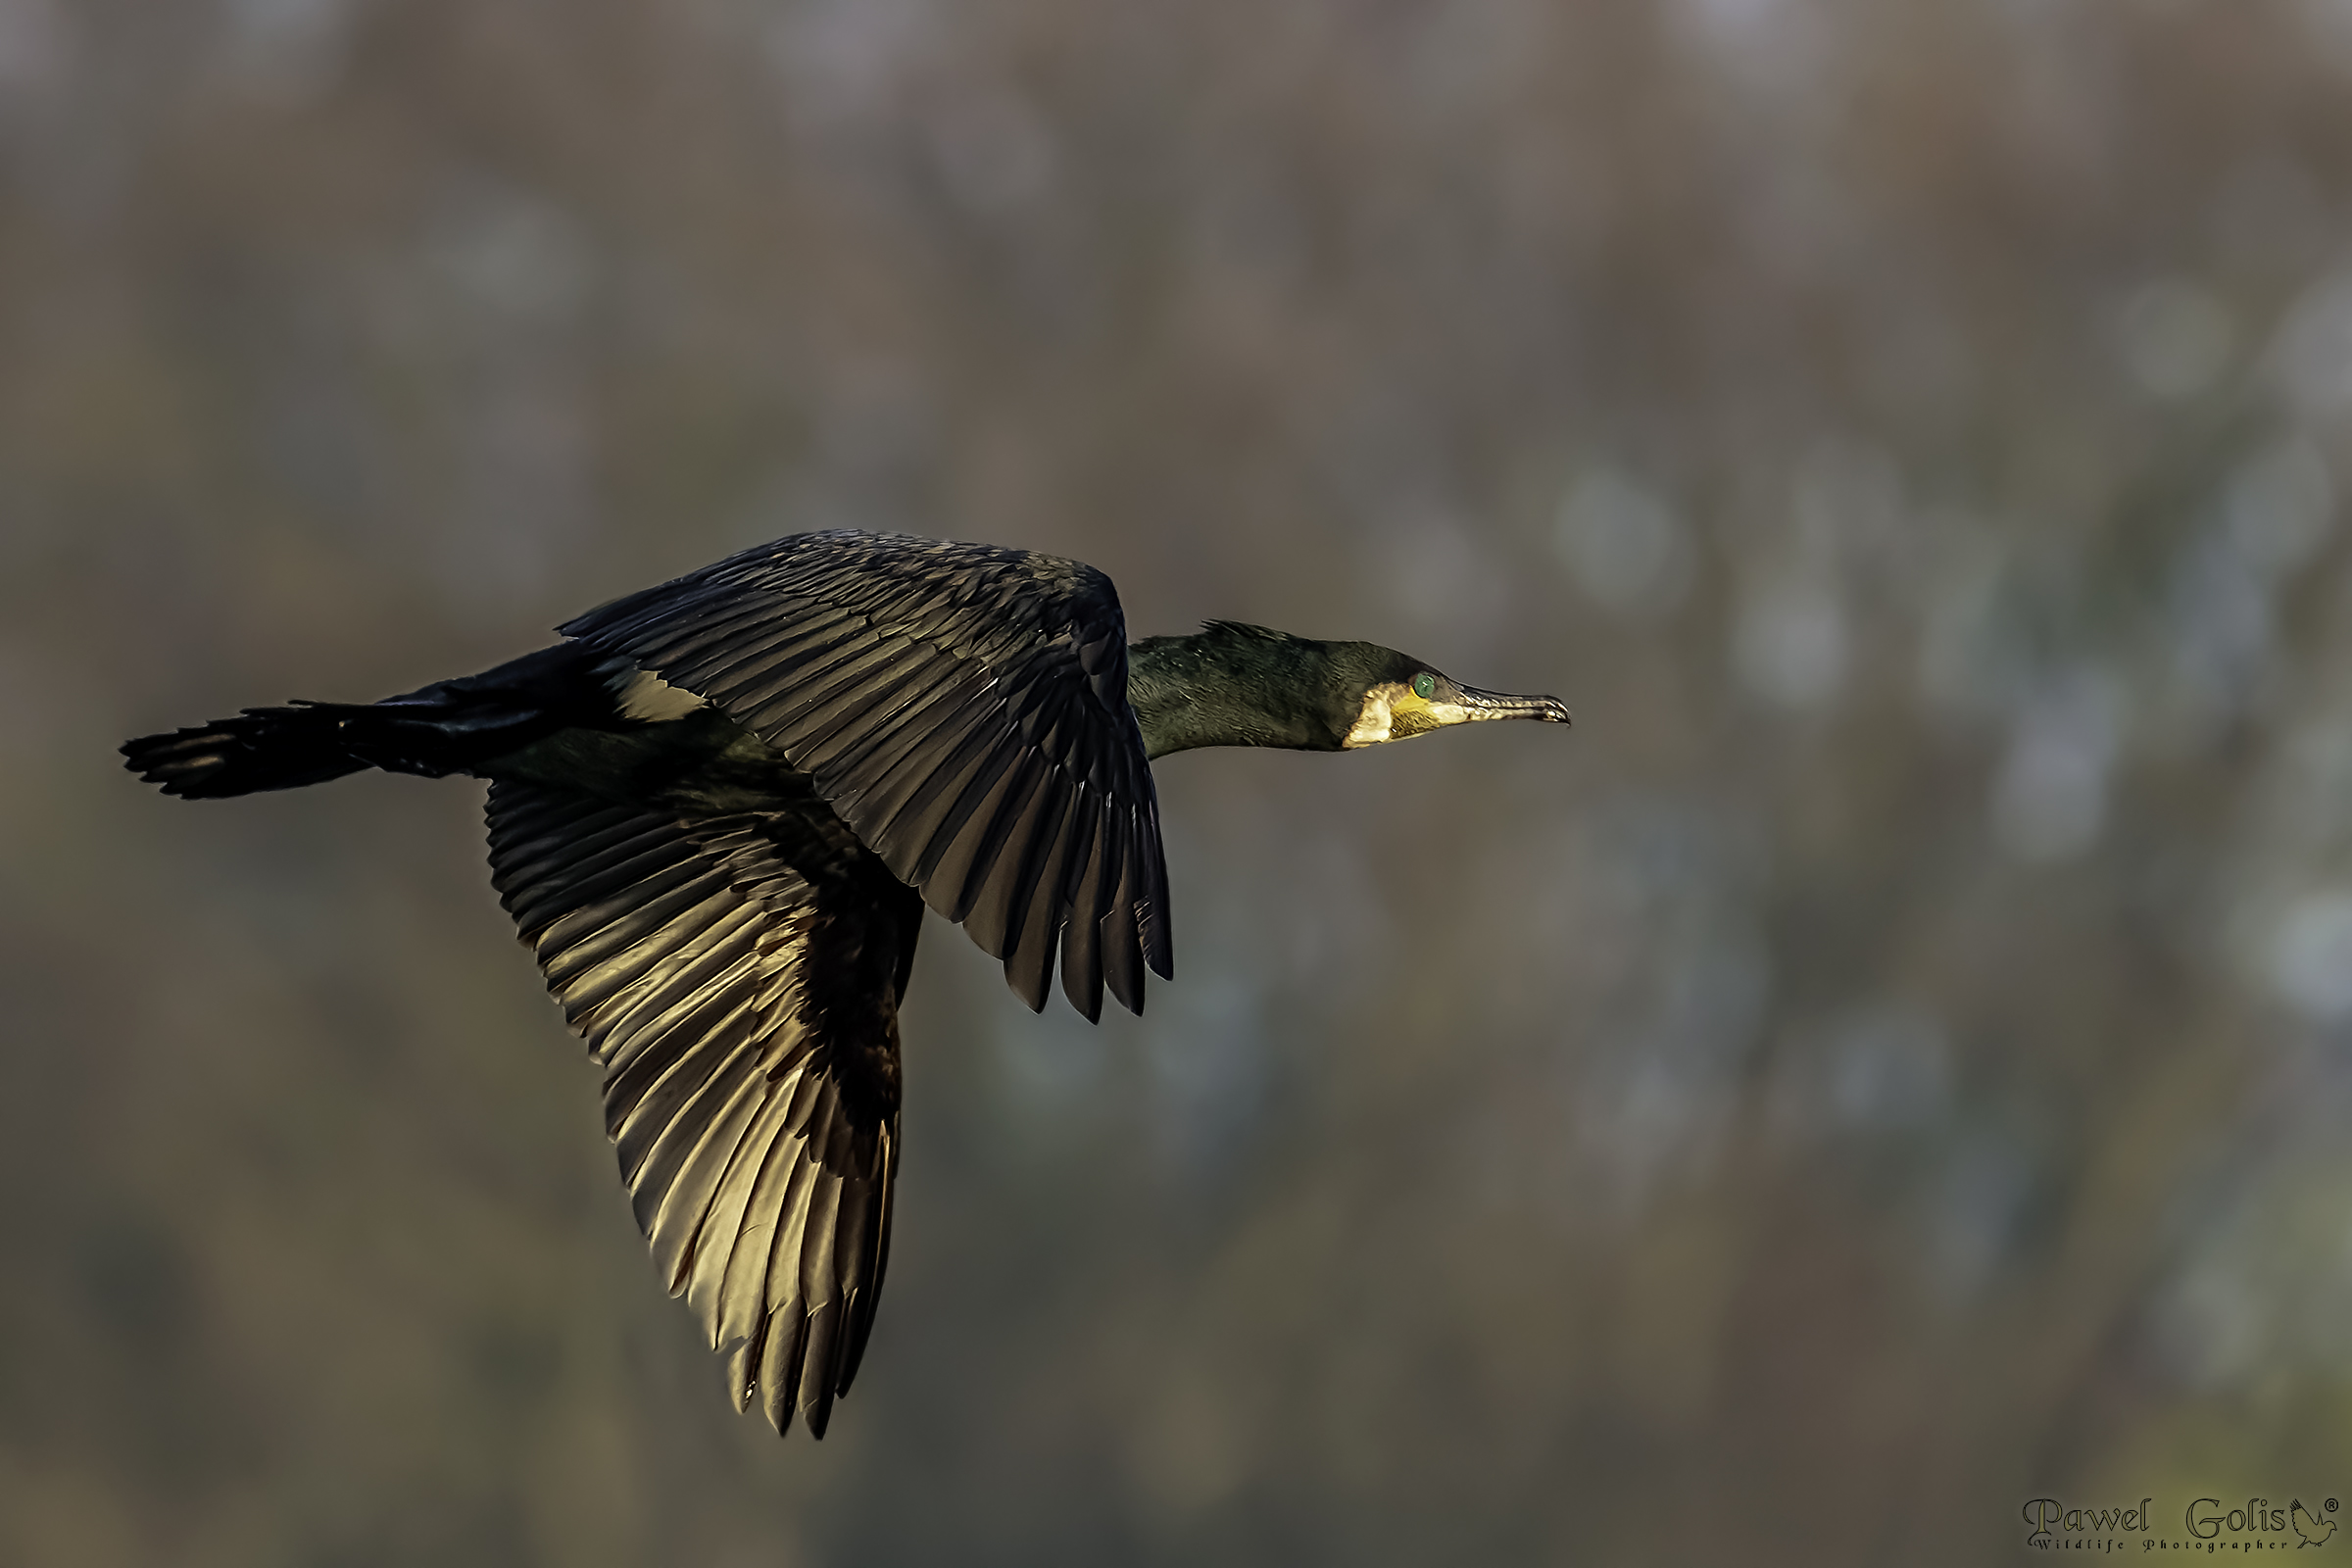 Great Cormorant (Phalacrocorax carbo)...